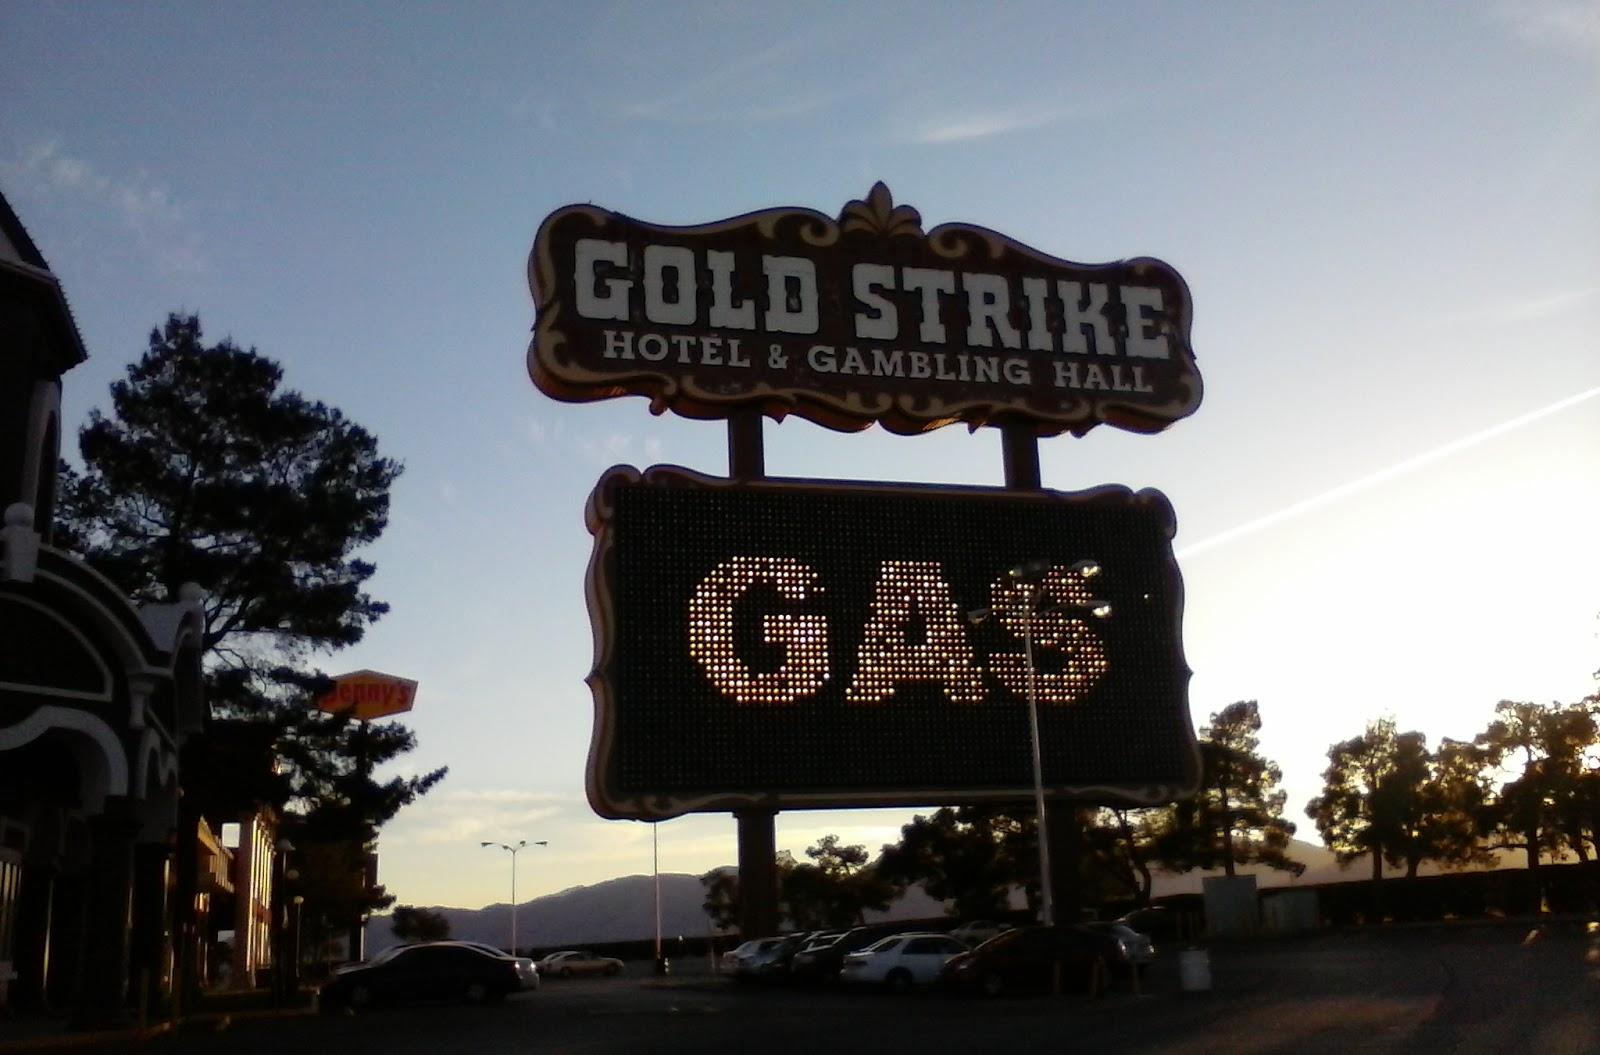 Gold strike casino coupons